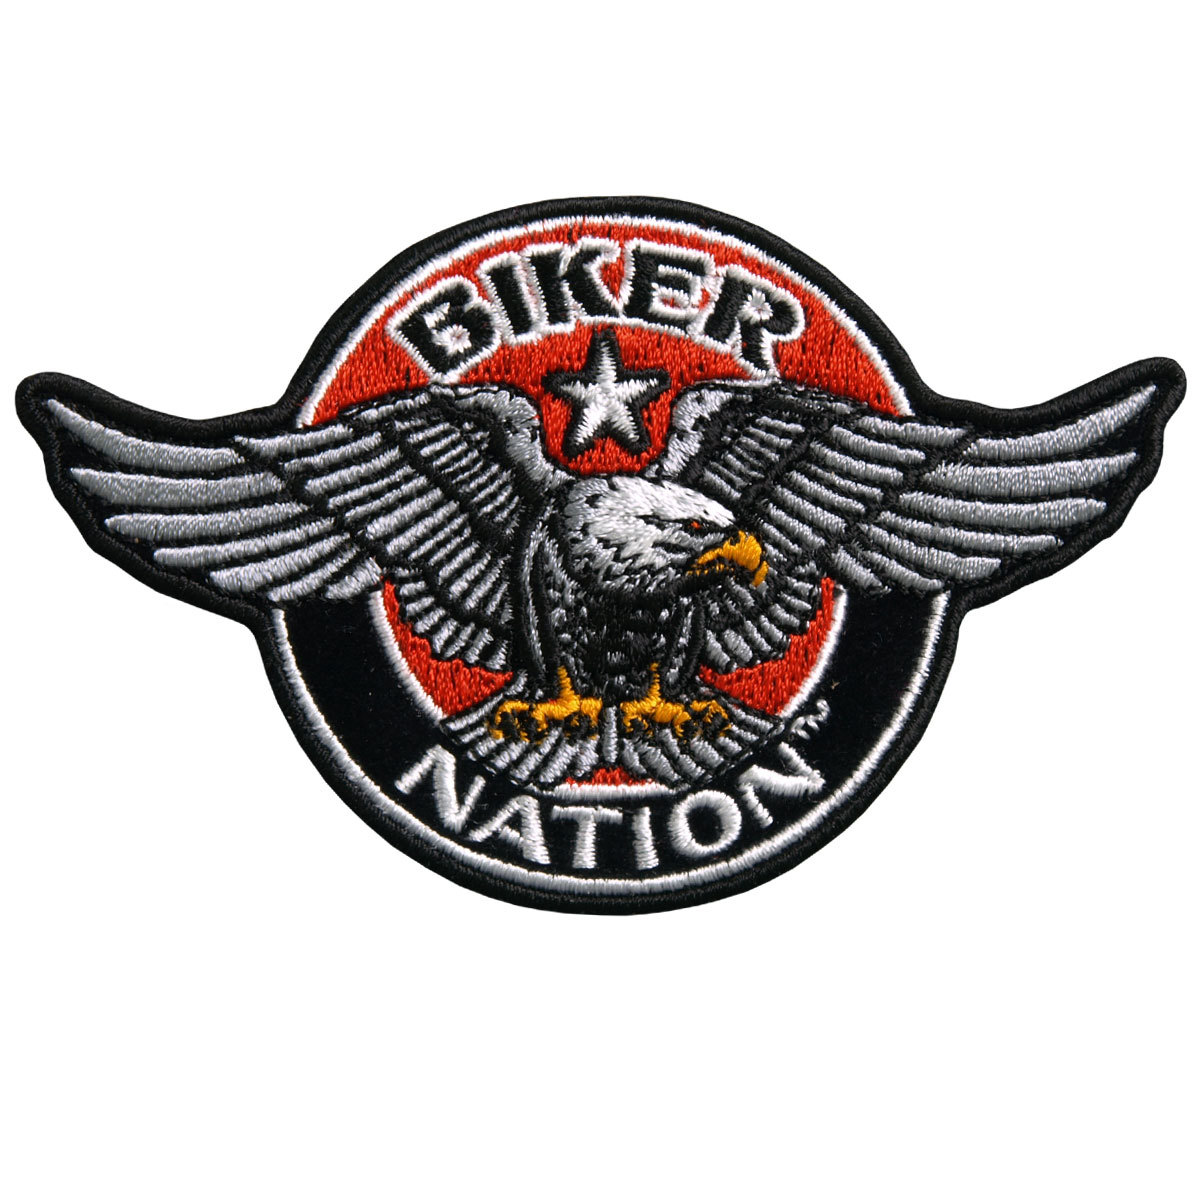 "Motorcycle Biker Uniform Patch 4/"" X 3/"" Biker Nation Eagle In Red"